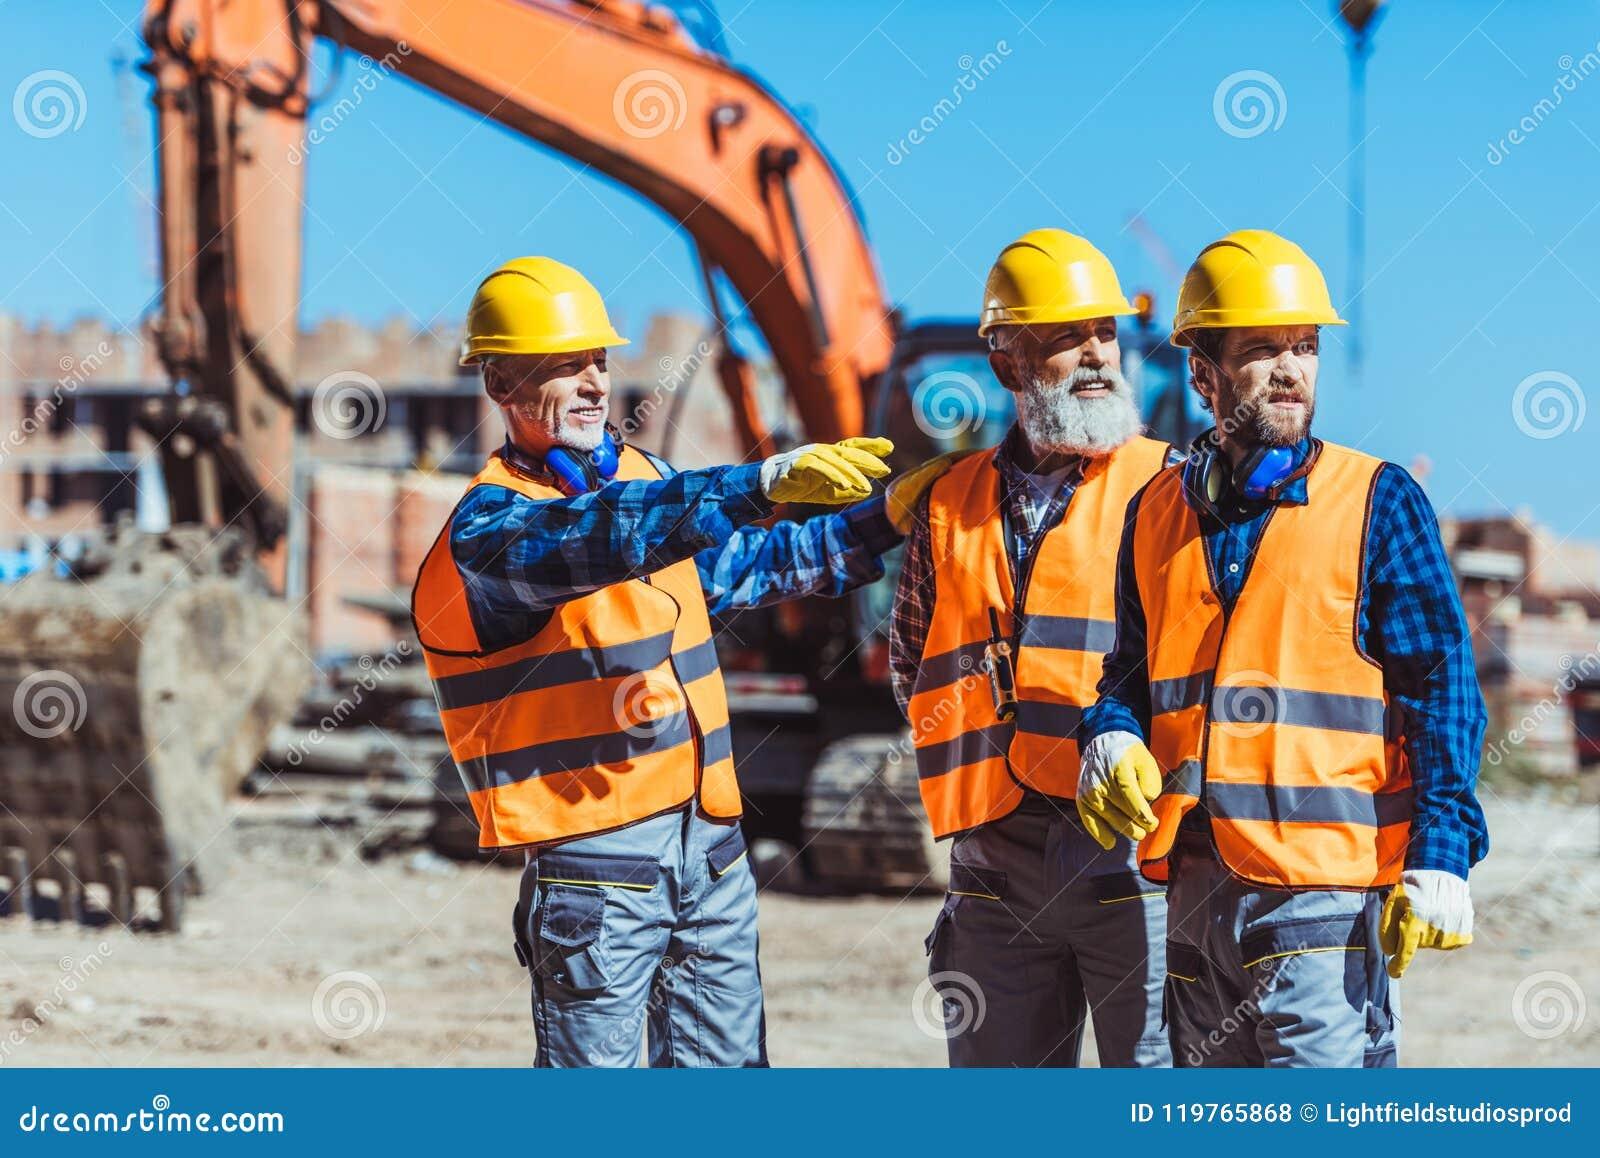 Contramestre que mostra a construtores algo no canteiro de obras apontando o seu